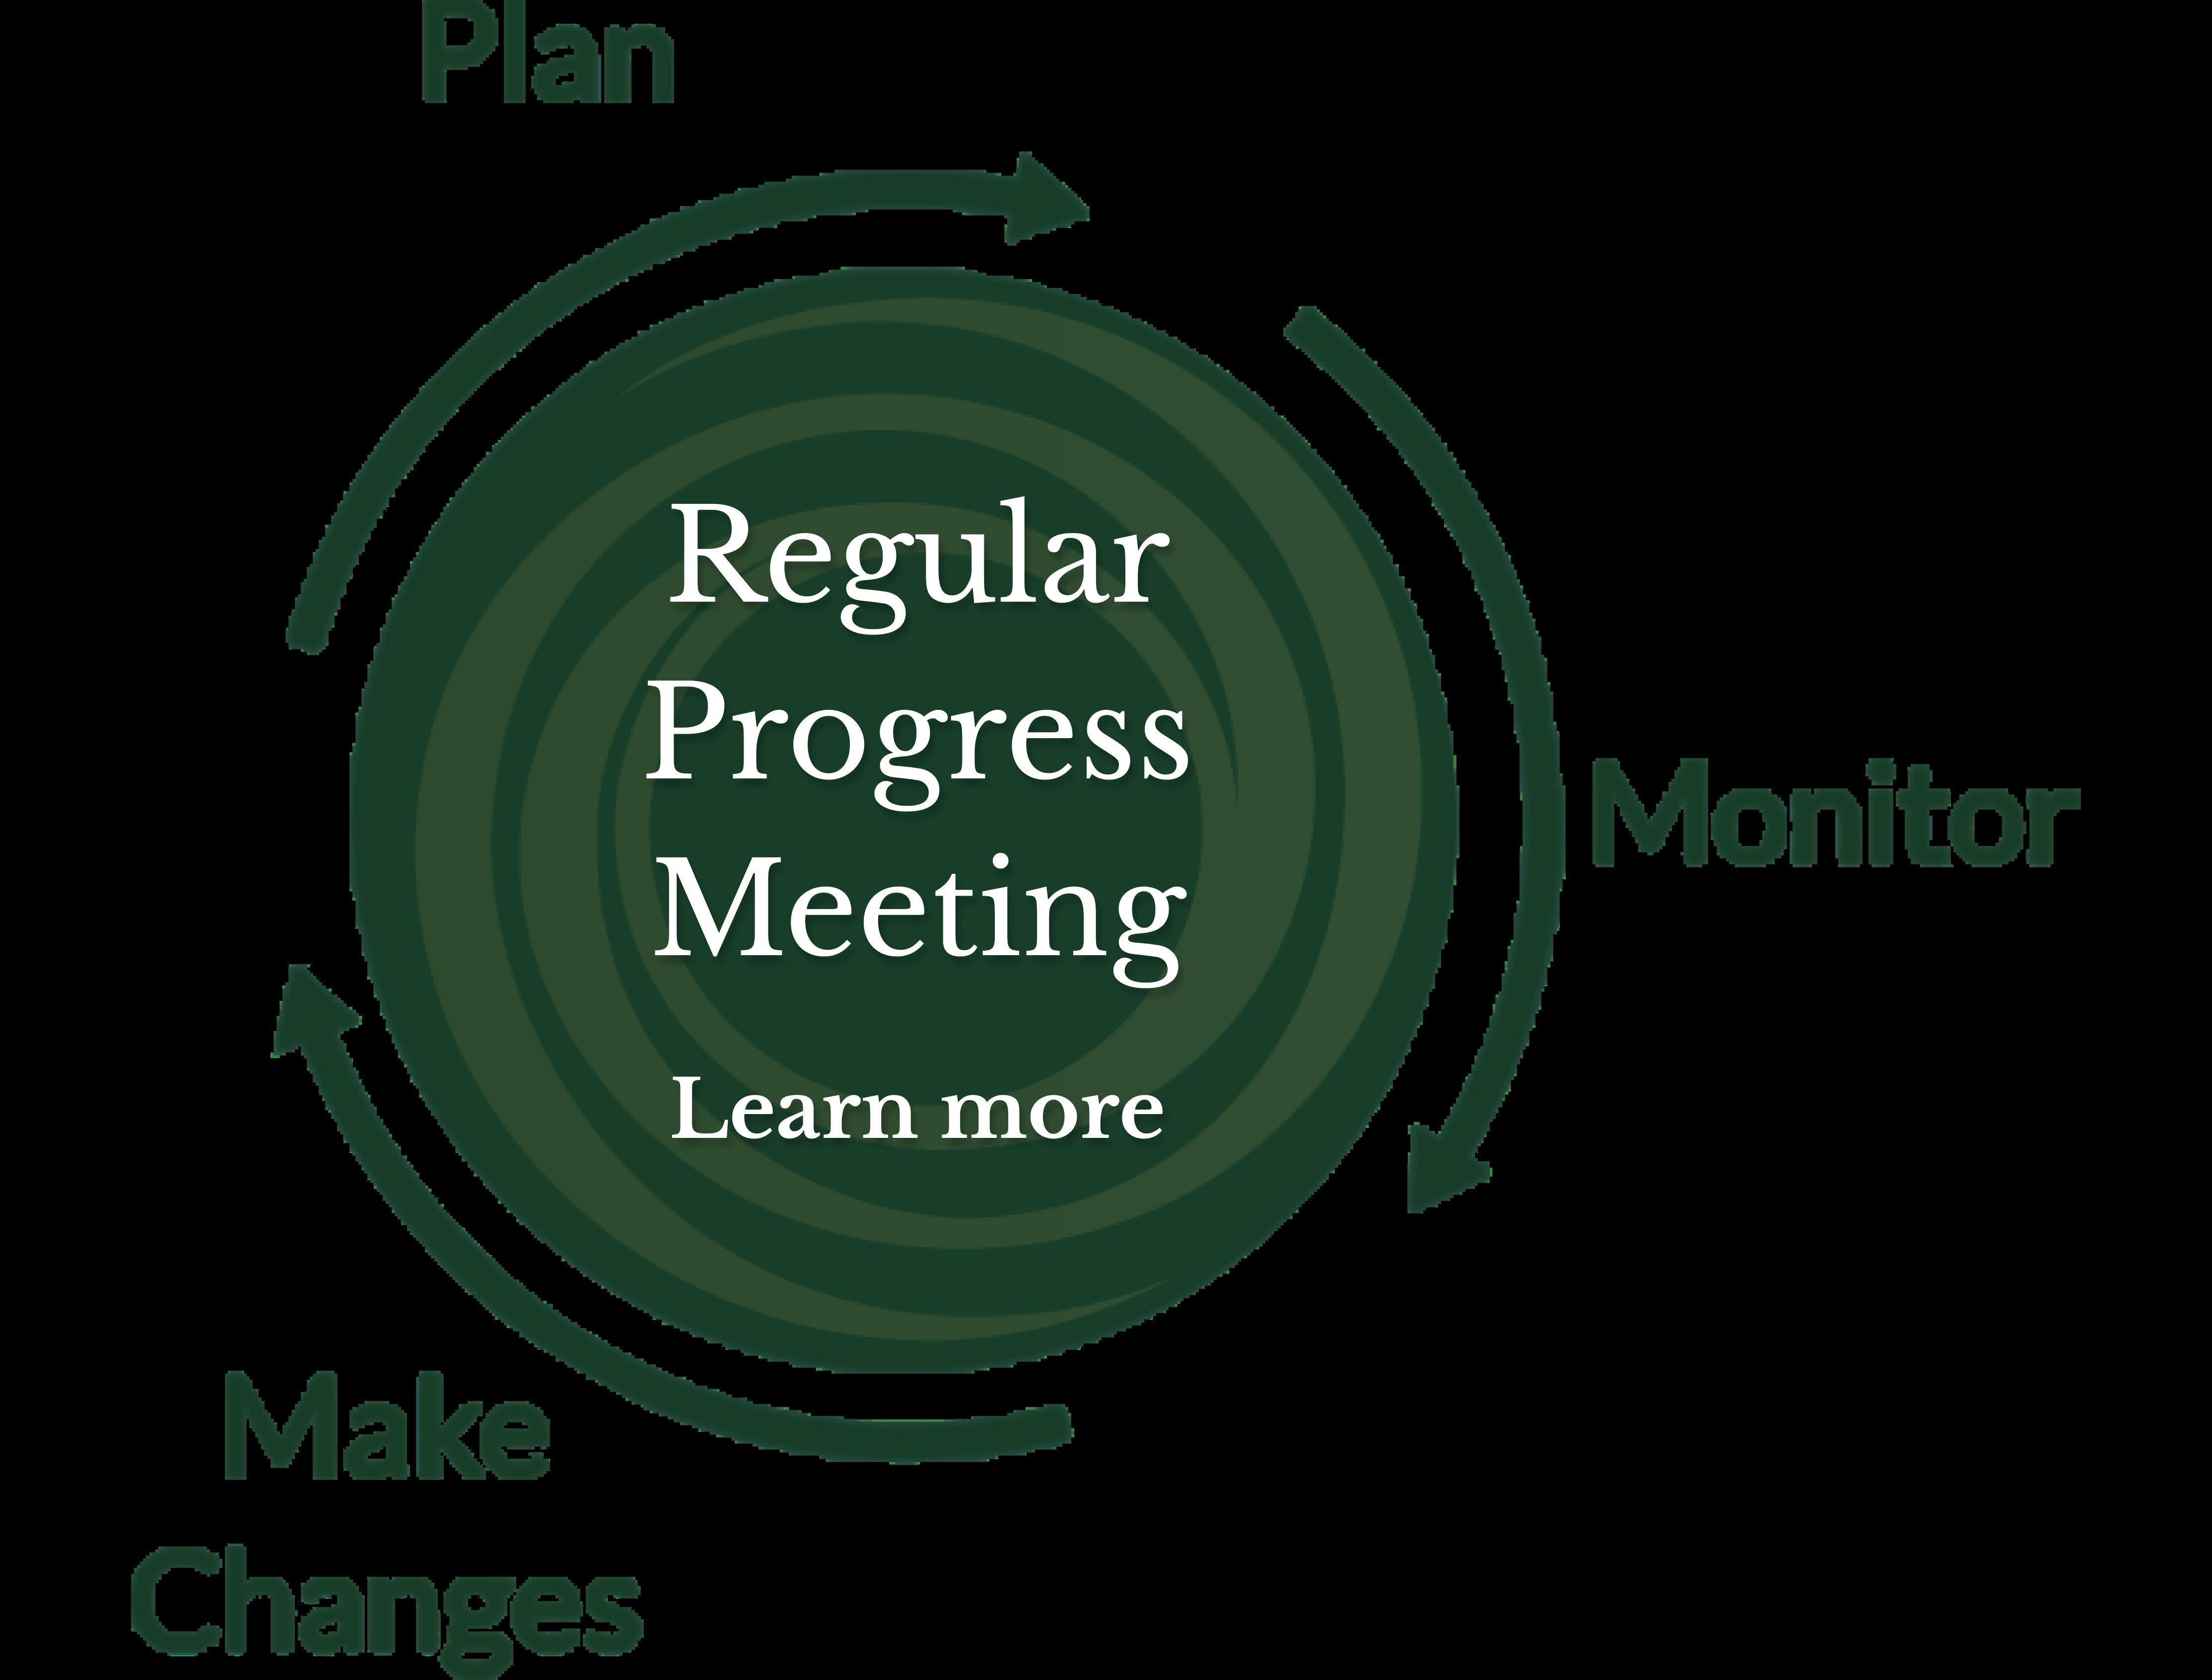 For Regular Progress Meeting details click here